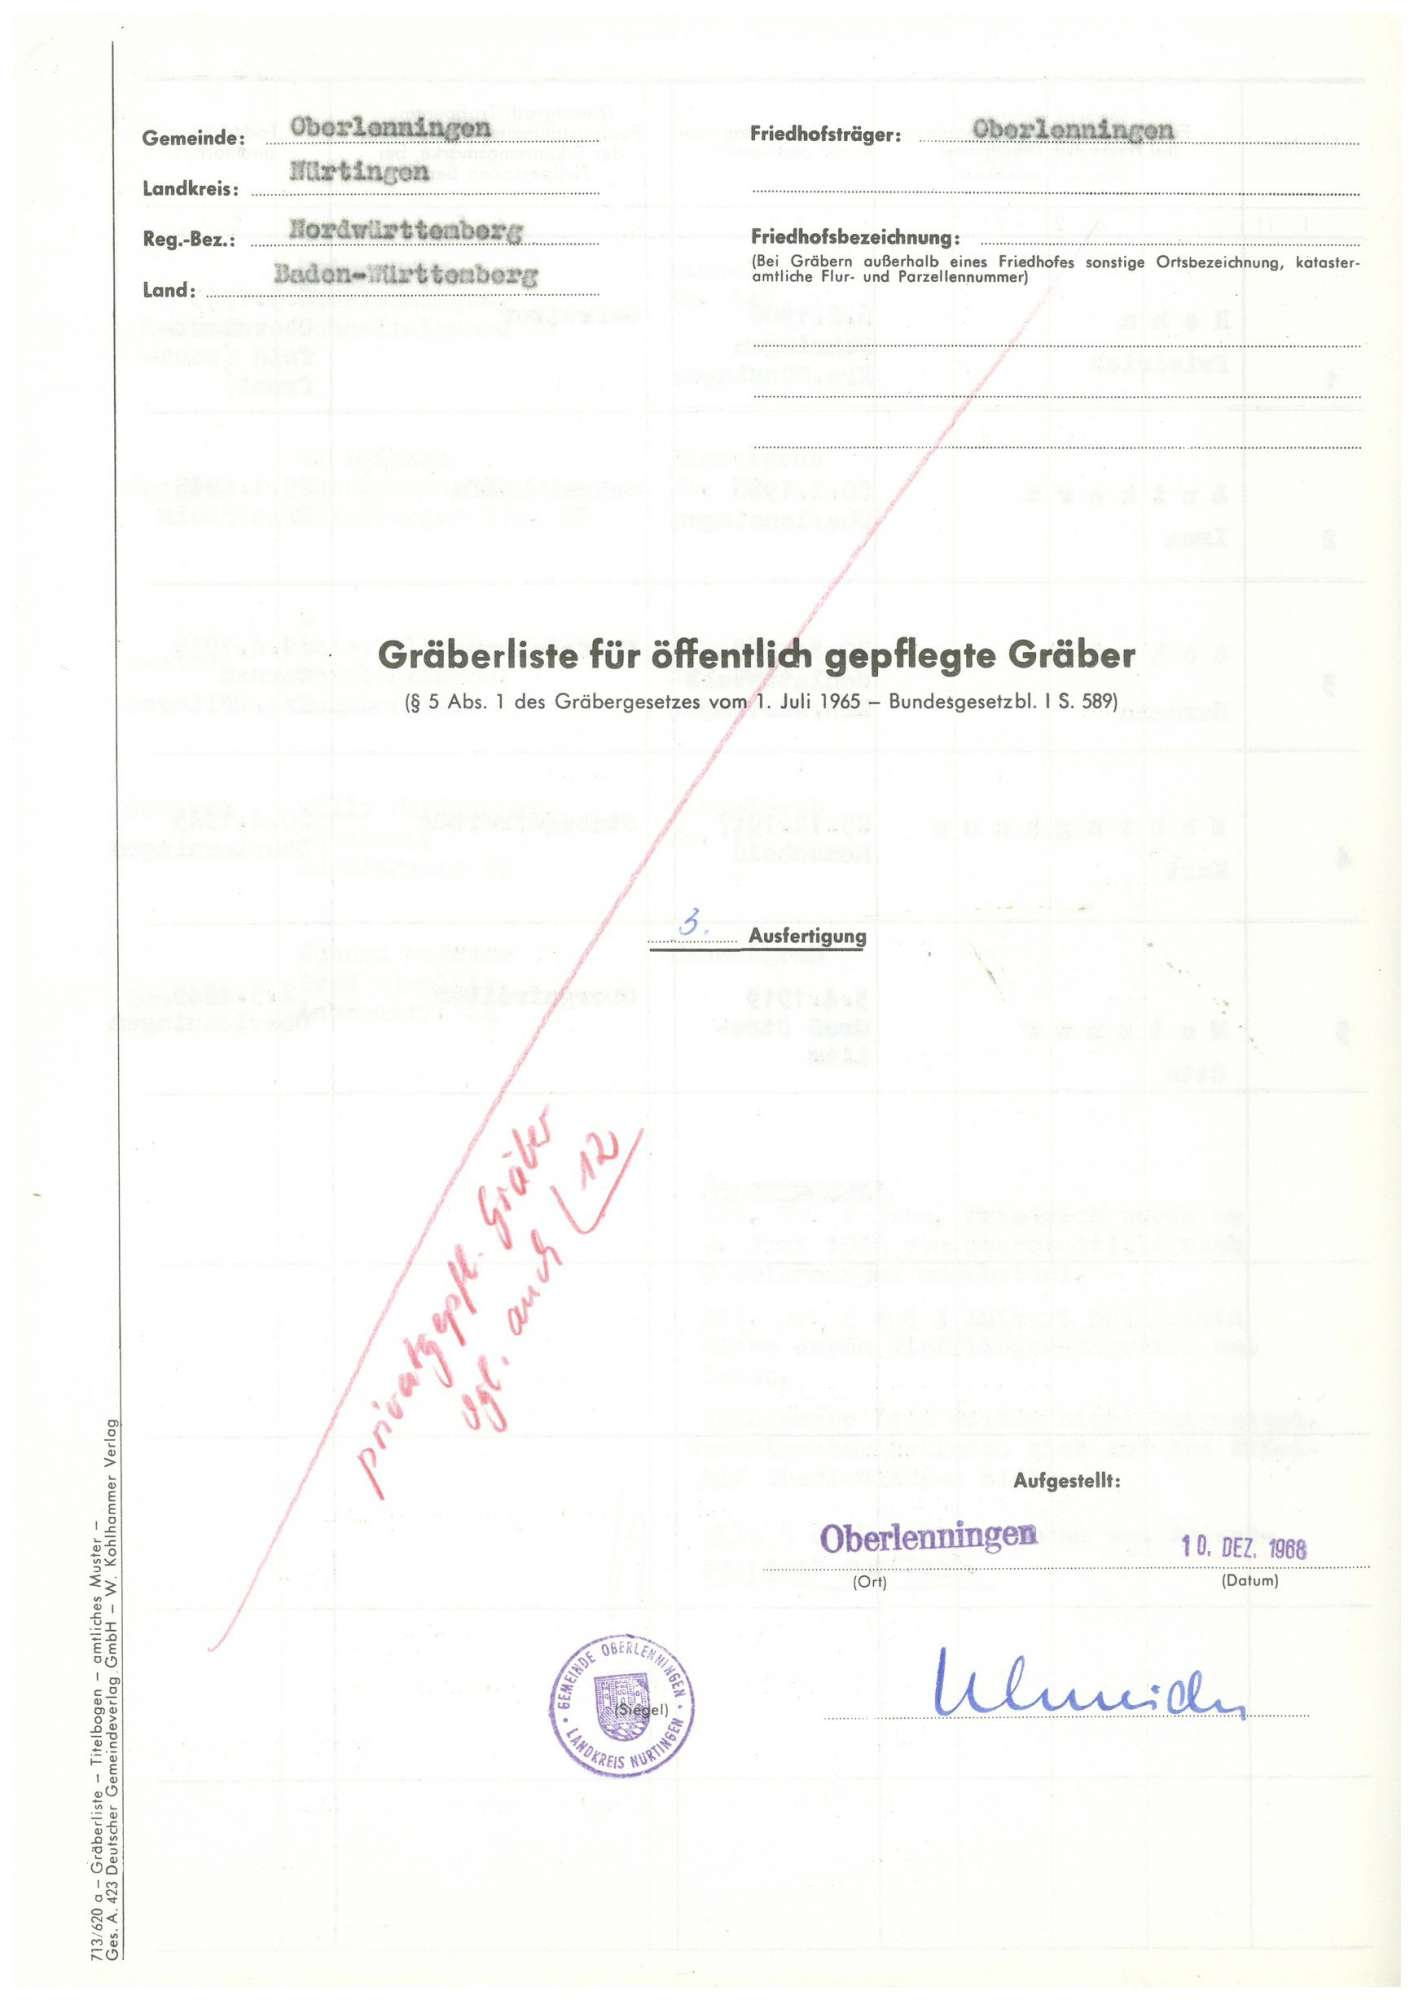 Oberlenningen, Bild 1